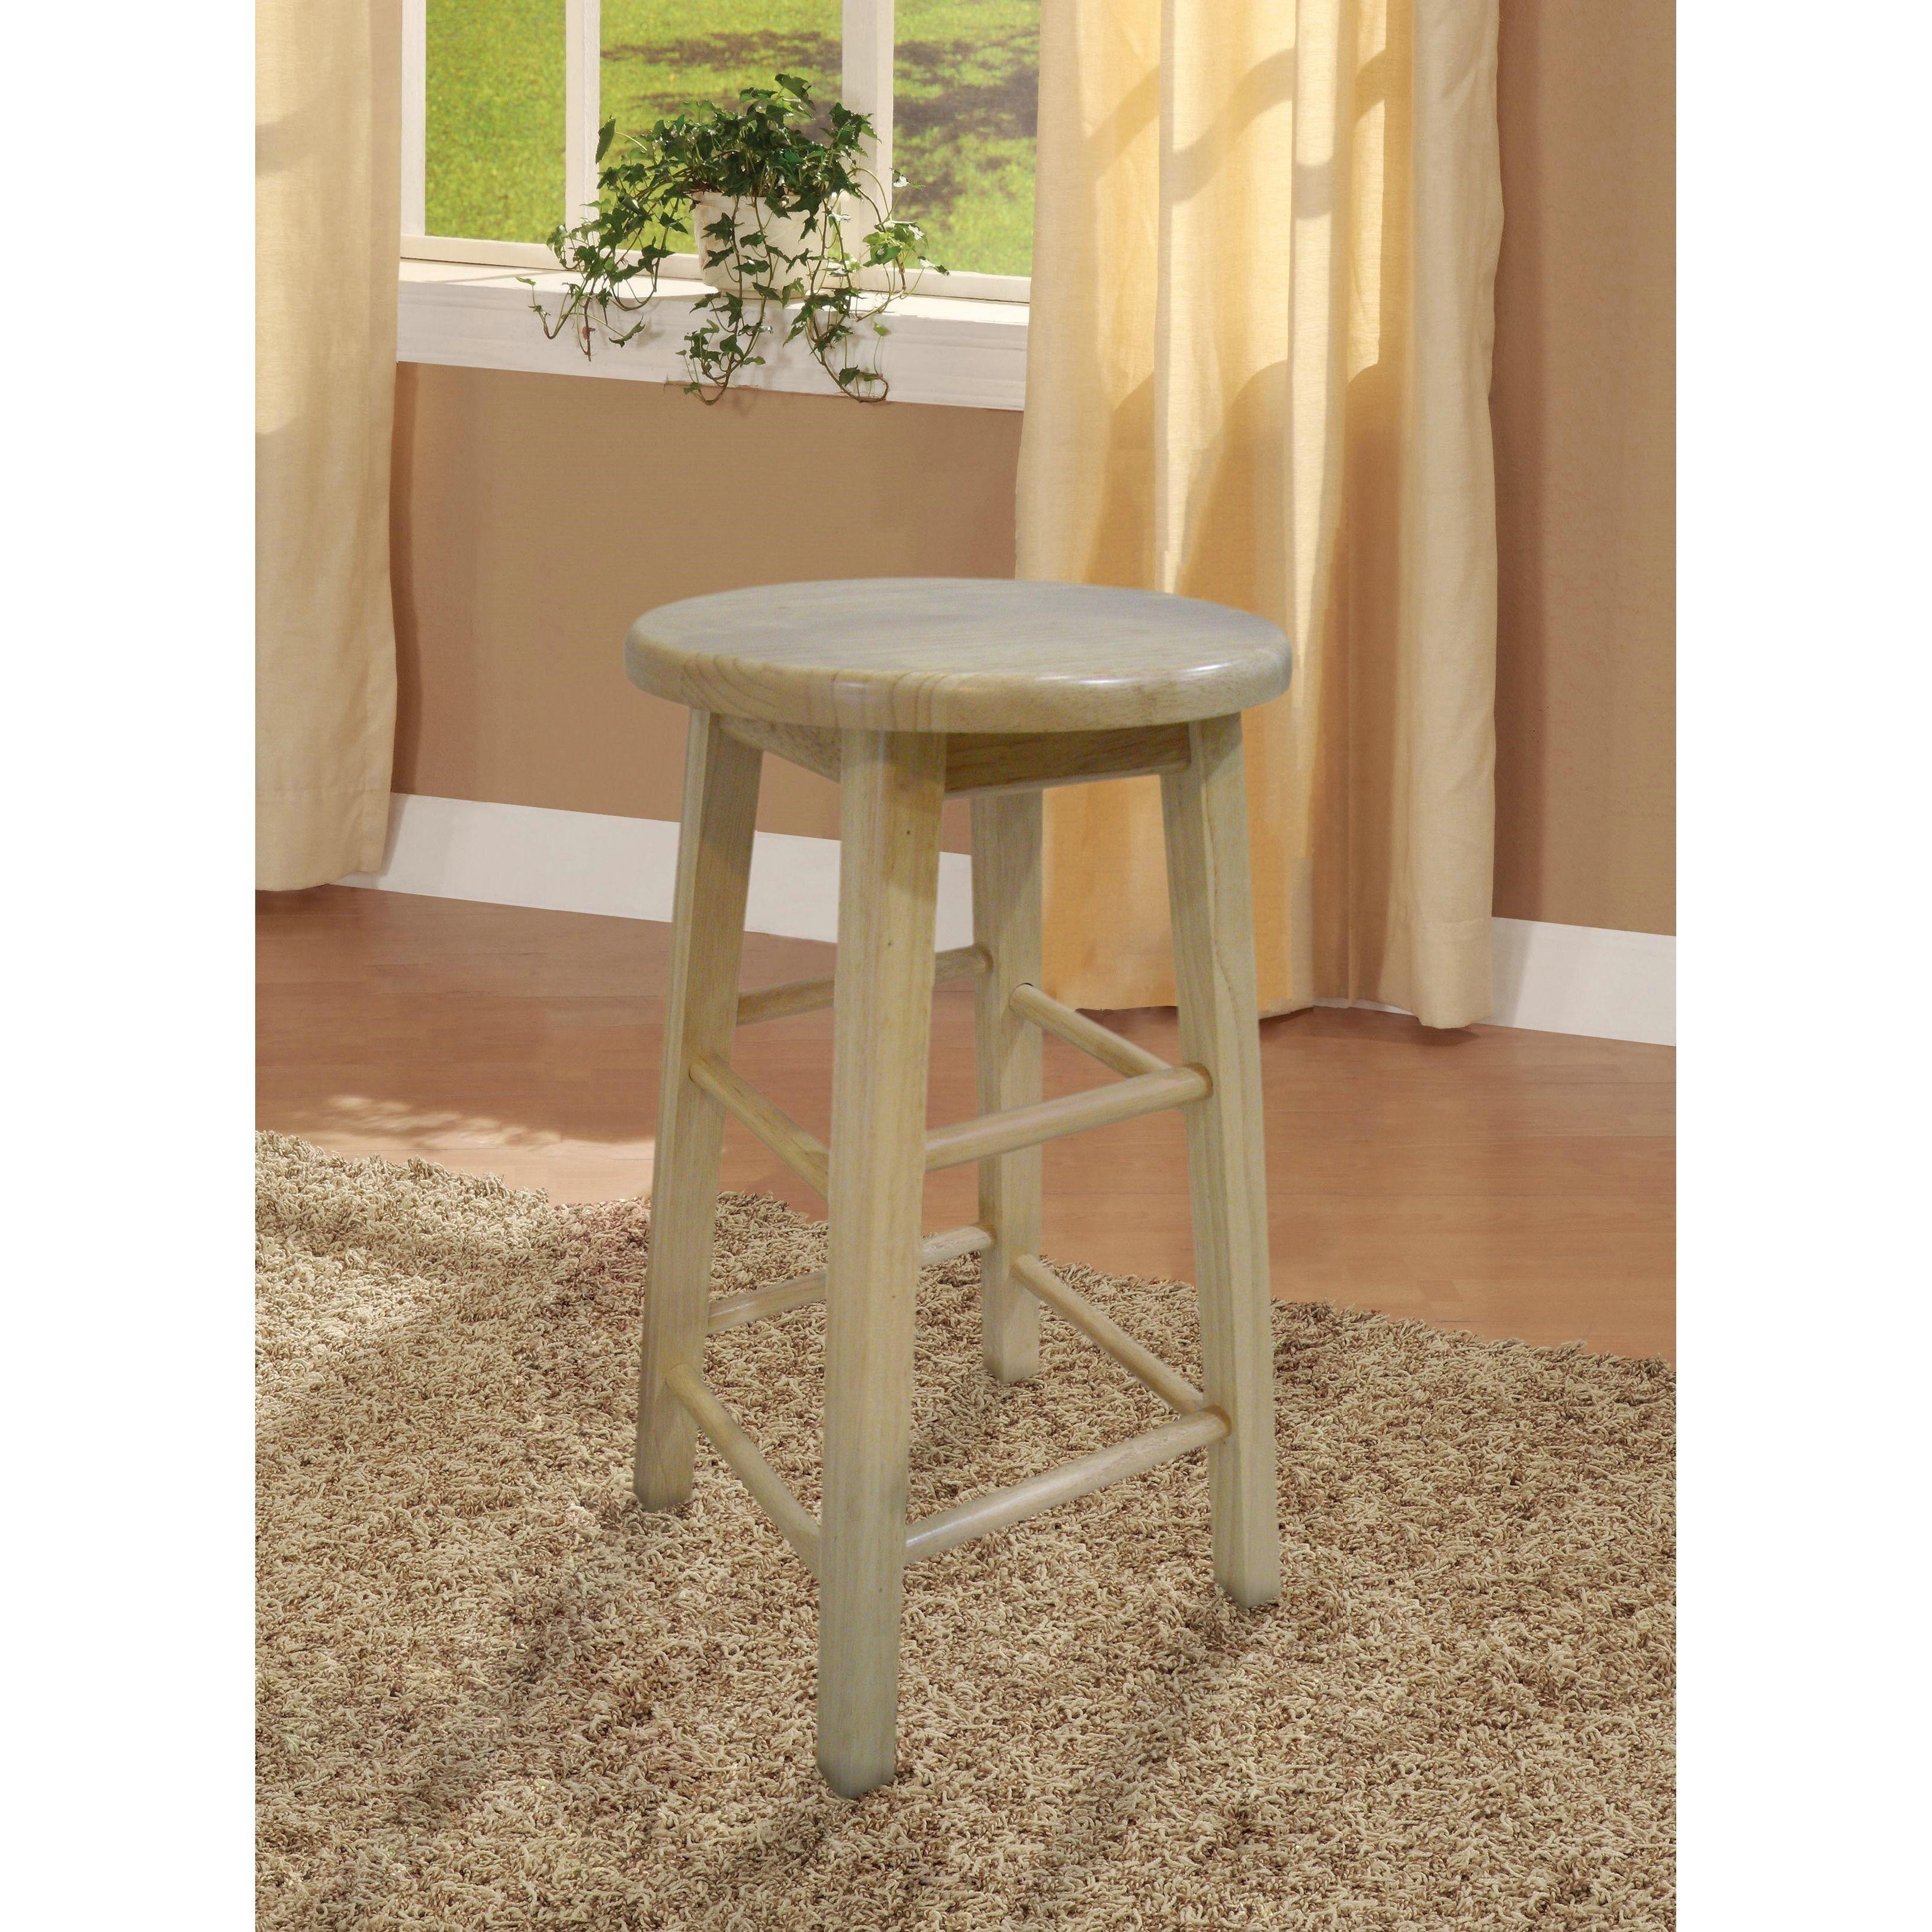 Strange The Gray Barn Woodland Way Backless Counter Height Stool 24 Machost Co Dining Chair Design Ideas Machostcouk